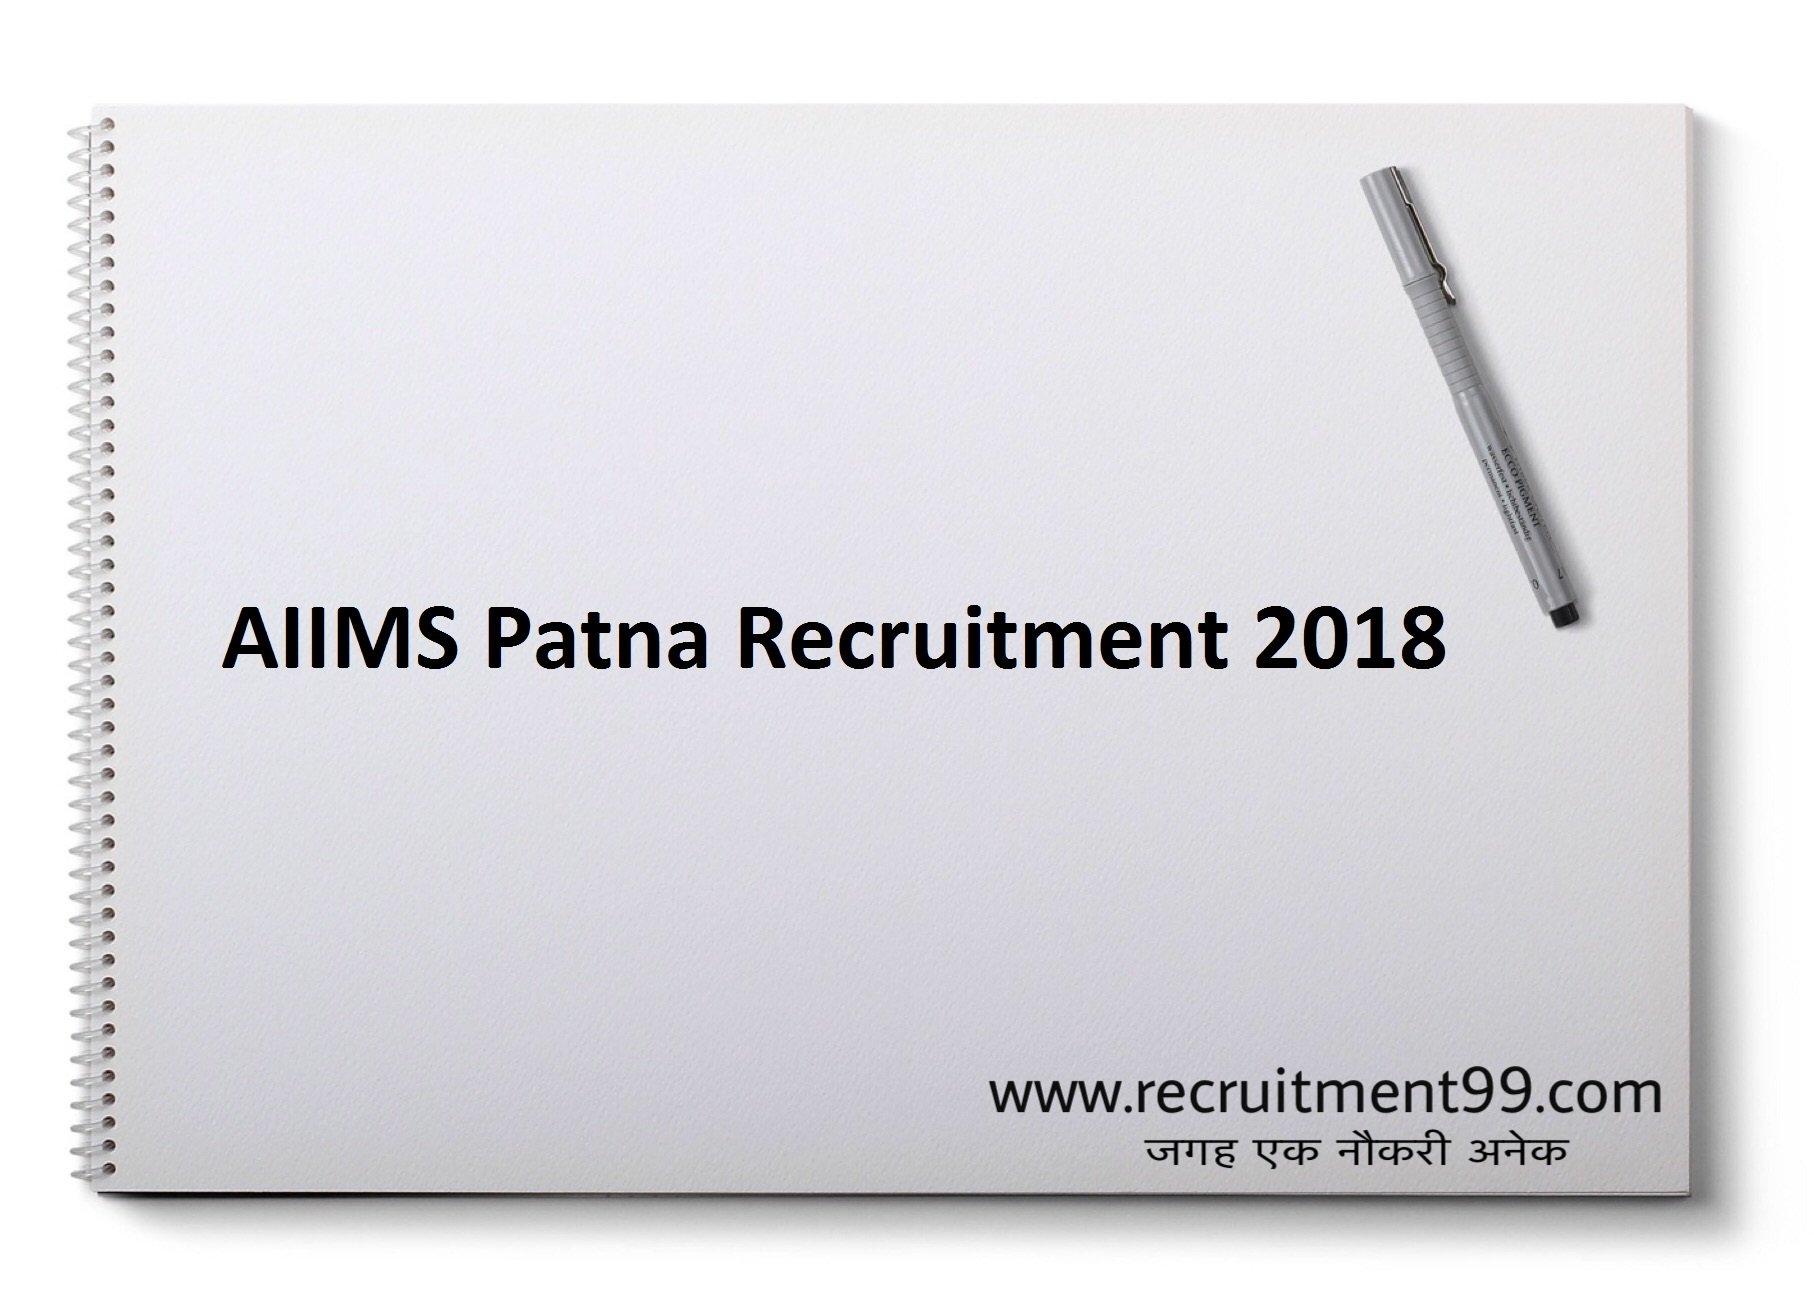 AIIMS Patna Additional Professor Associate Professor Assistant Professor Recruitment Admit Card & Result 2018